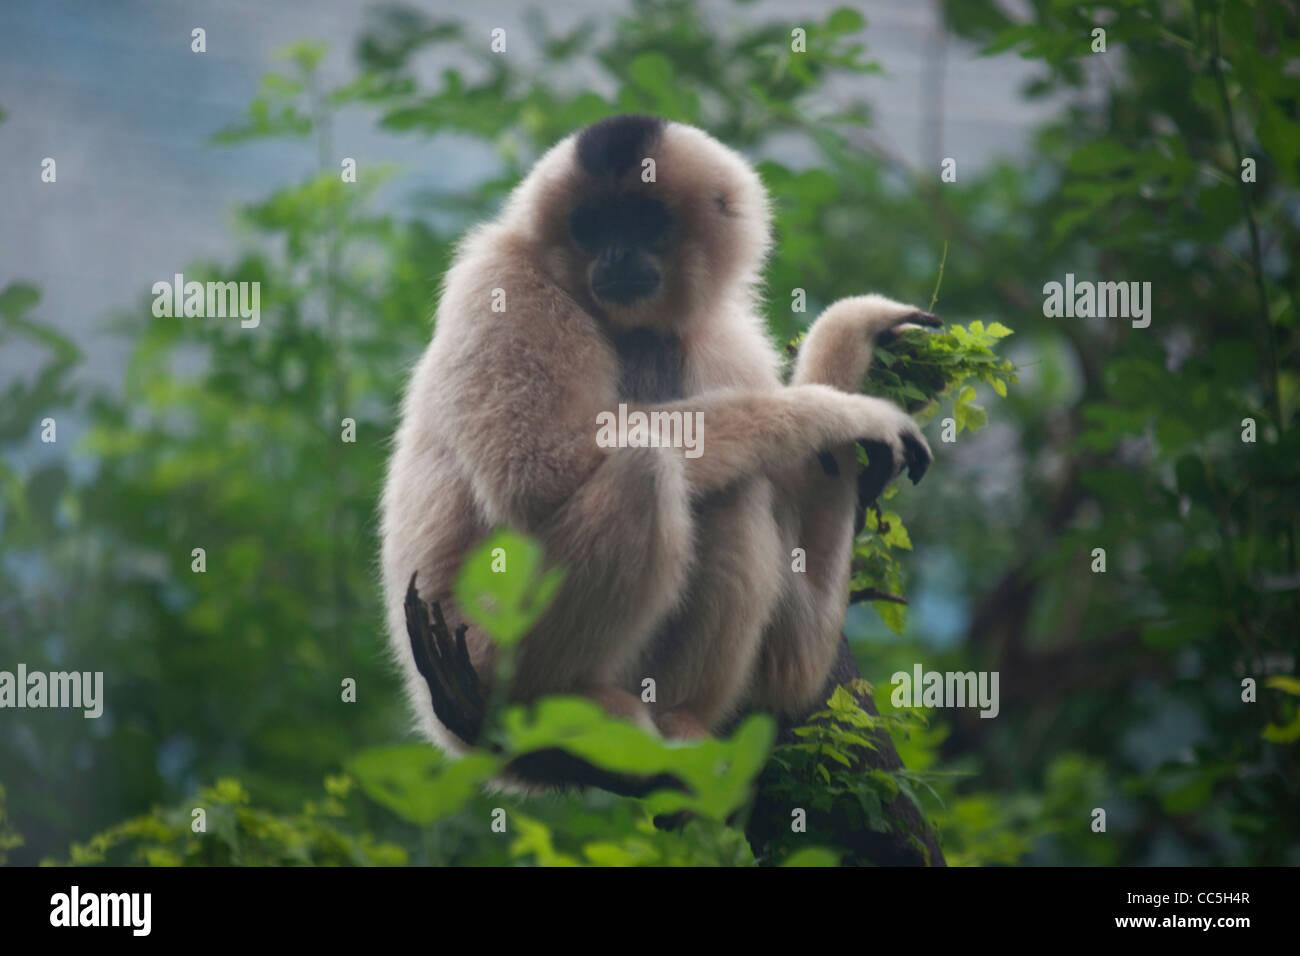 Rhinopithecus roxellanae, Beijing Zoo, China - Stock Image